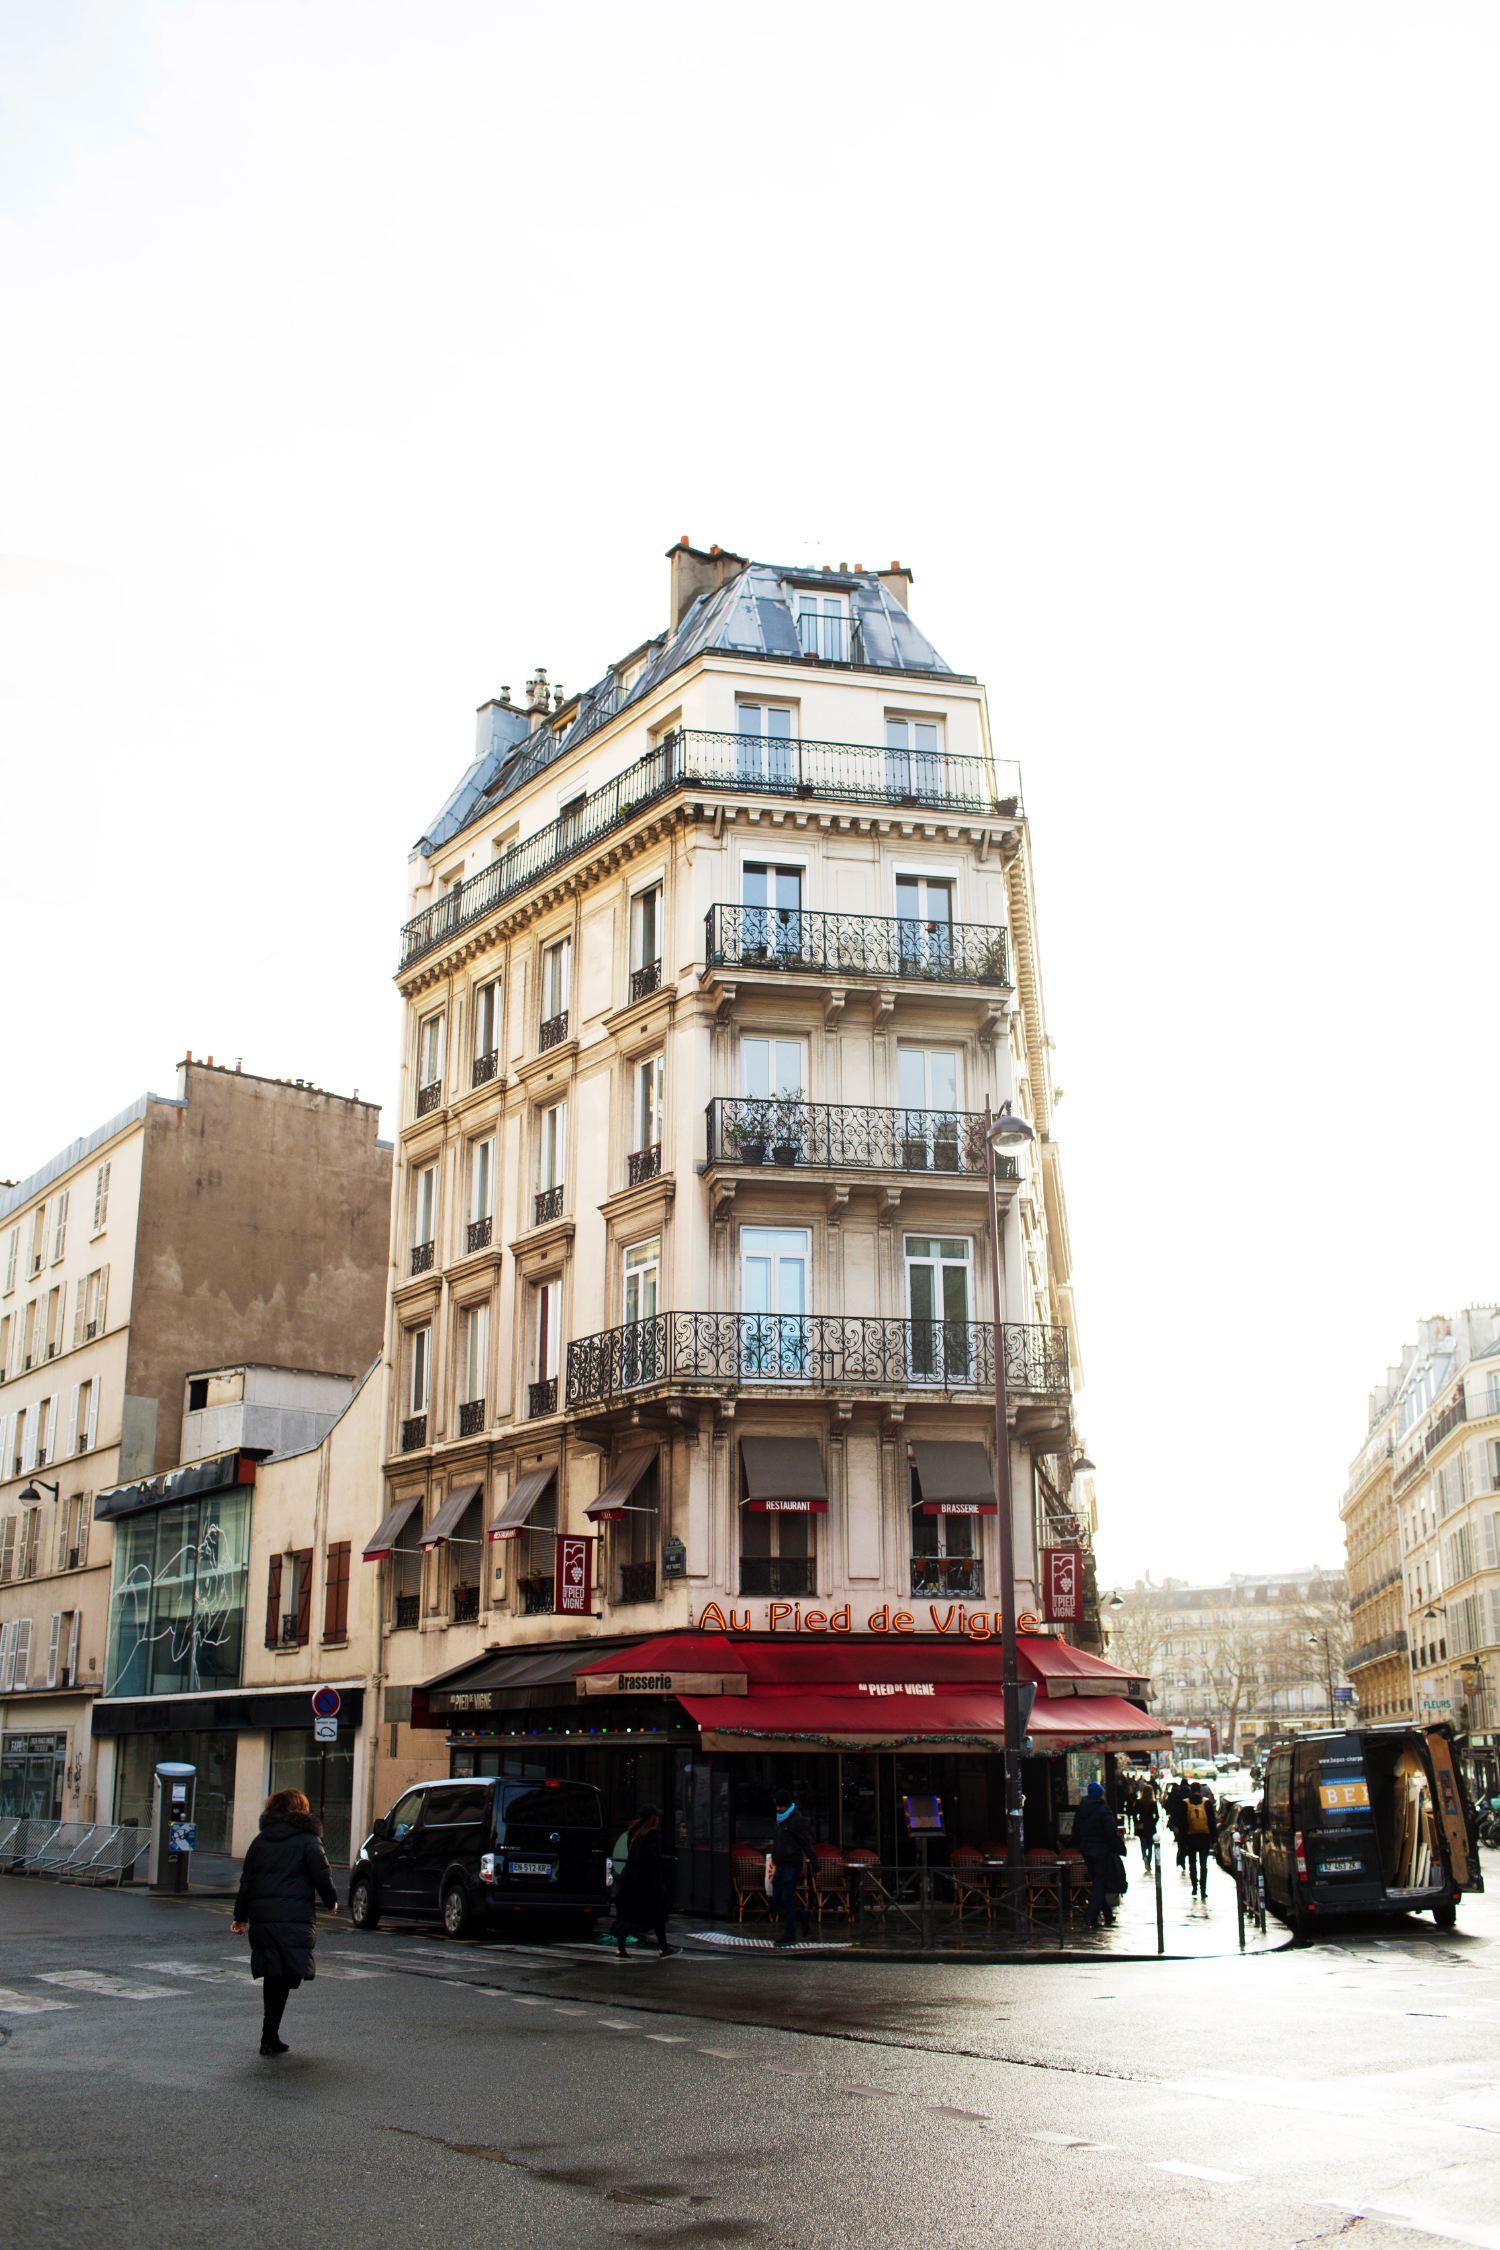 You've Got Flair | Travel | Paris | 041.JPG